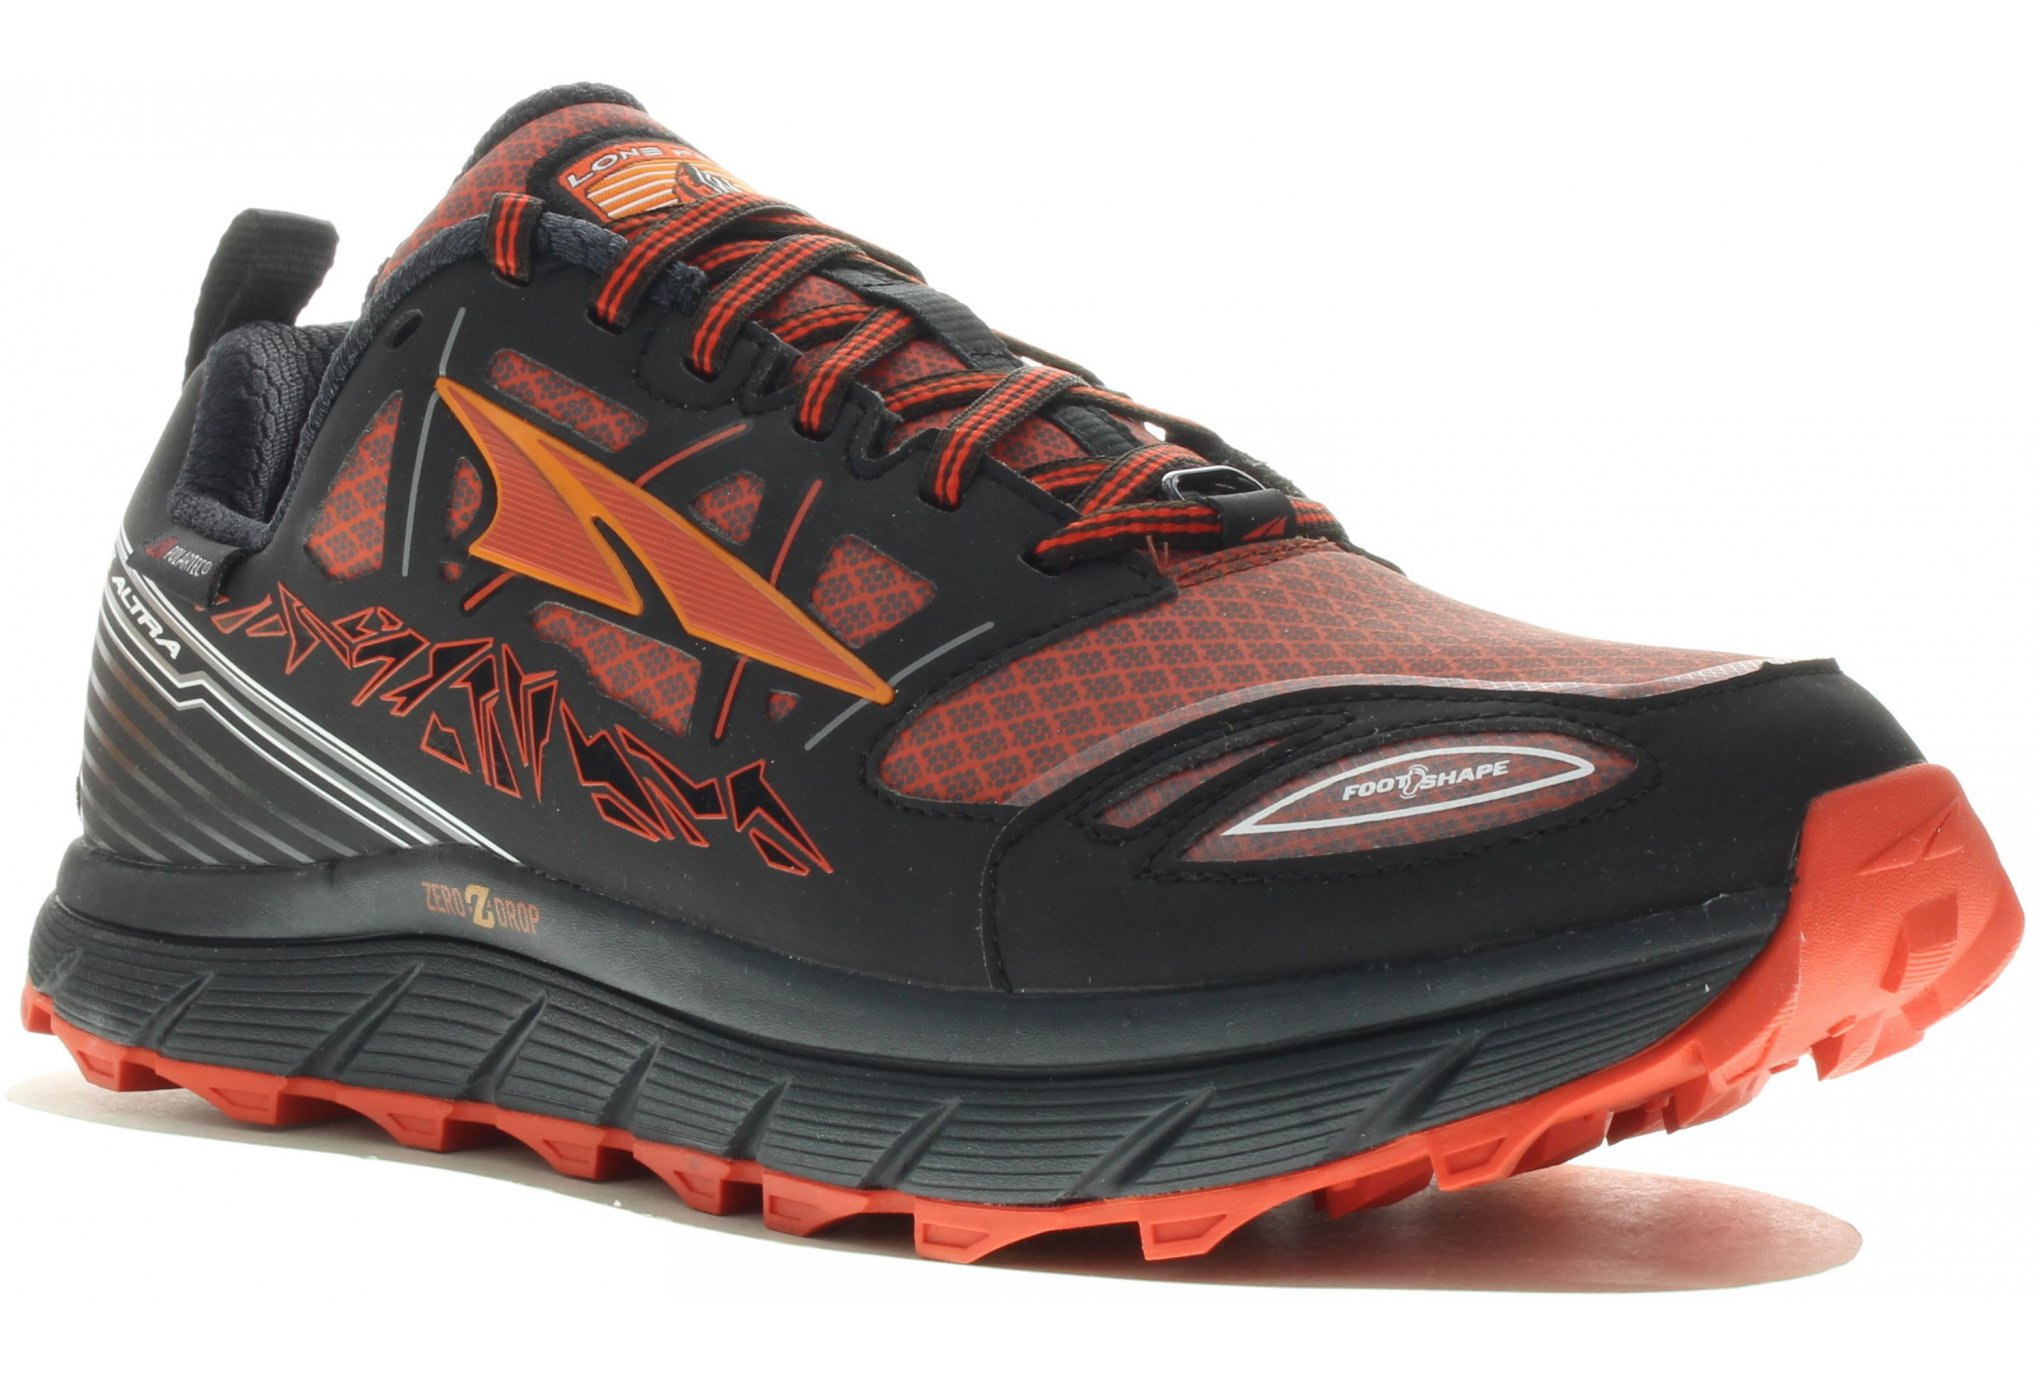 Altra Lone peak neoshell 3.0 m chaussures homme